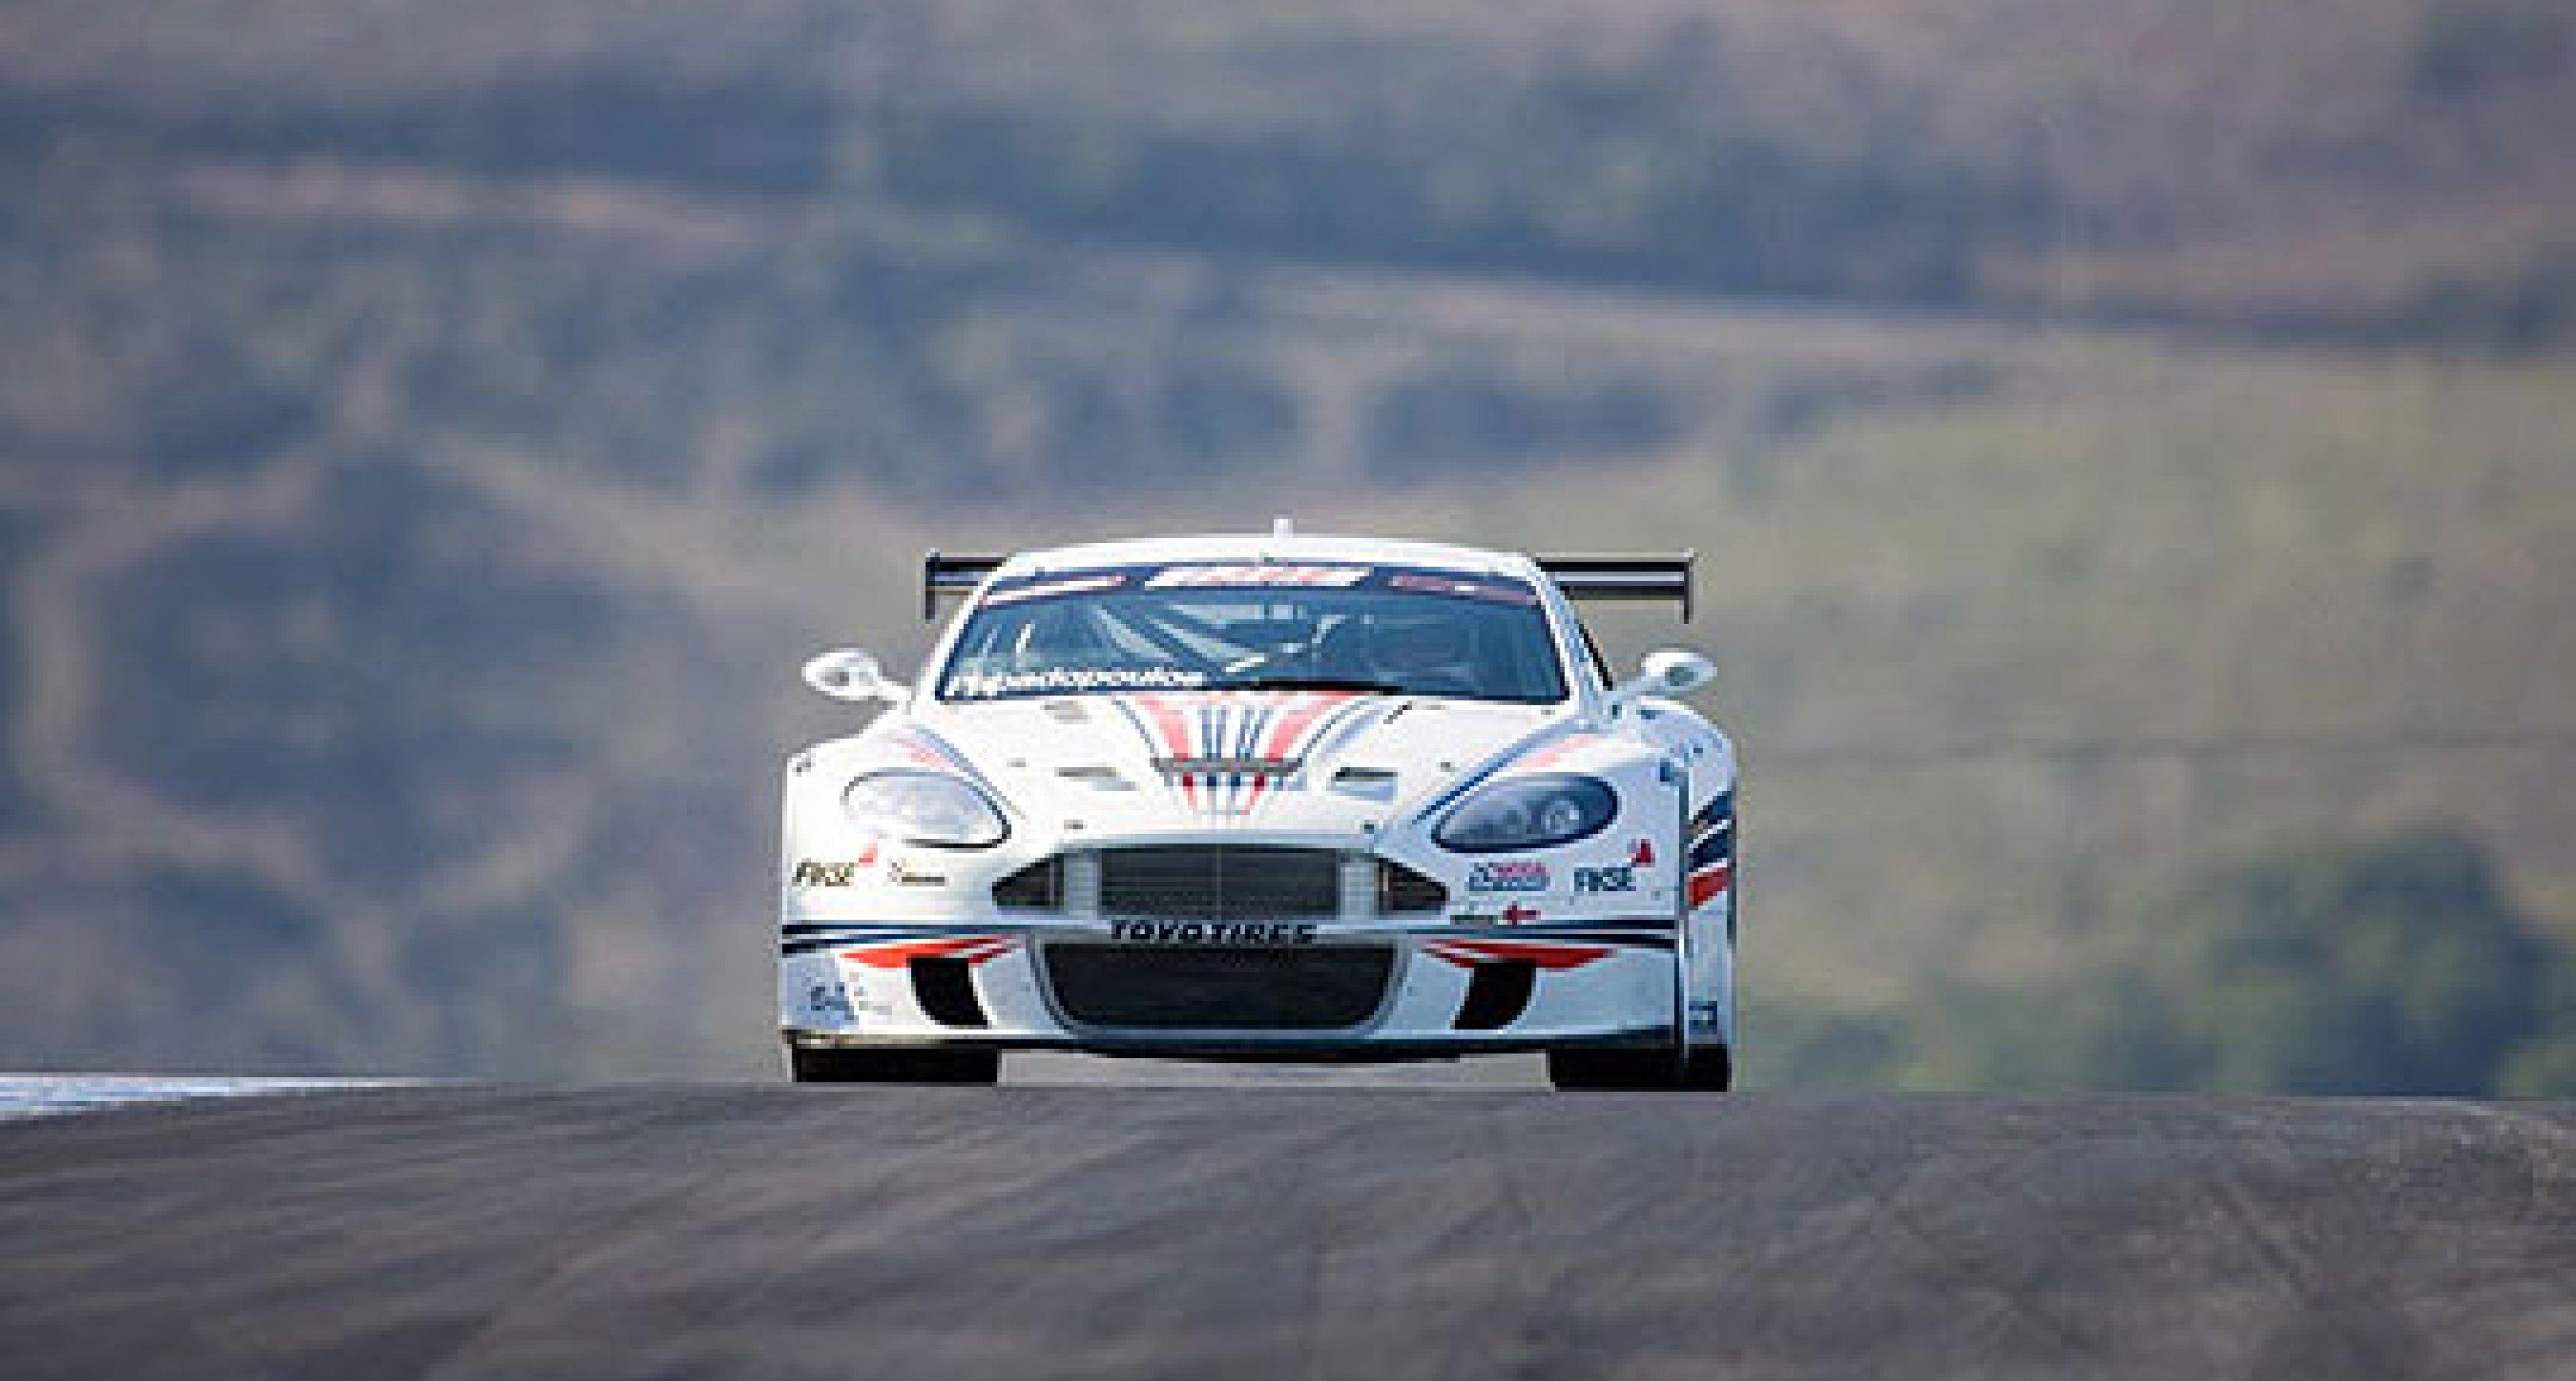 Autosport Designs Aston Martin DBRS9s at Laguna Seca 2006